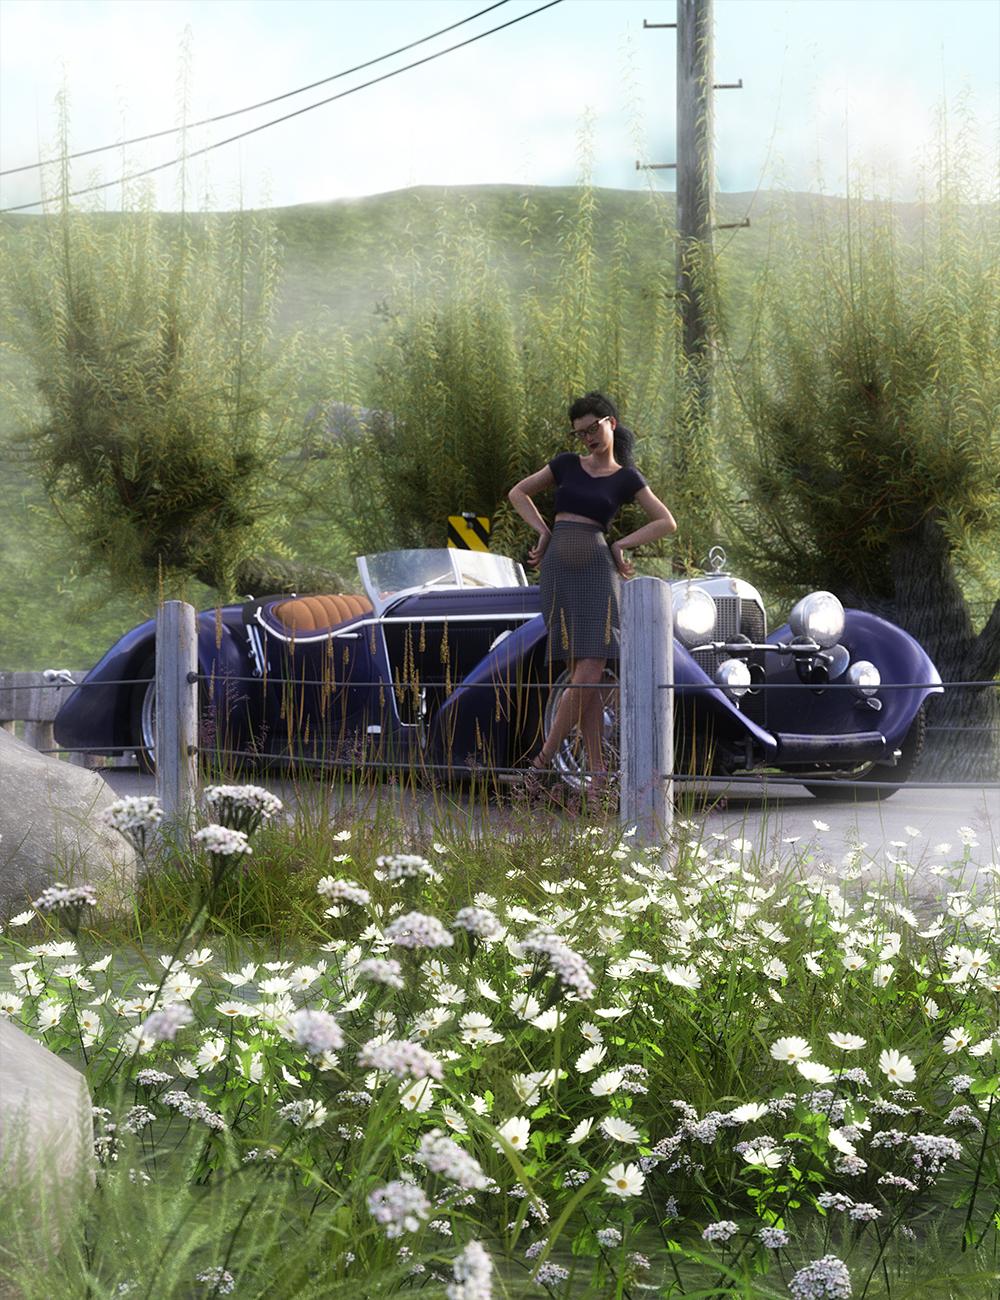 Roadside Flowering Plants for Daz Studio and Iray by: MartinJFrost, 3D Models by Daz 3D